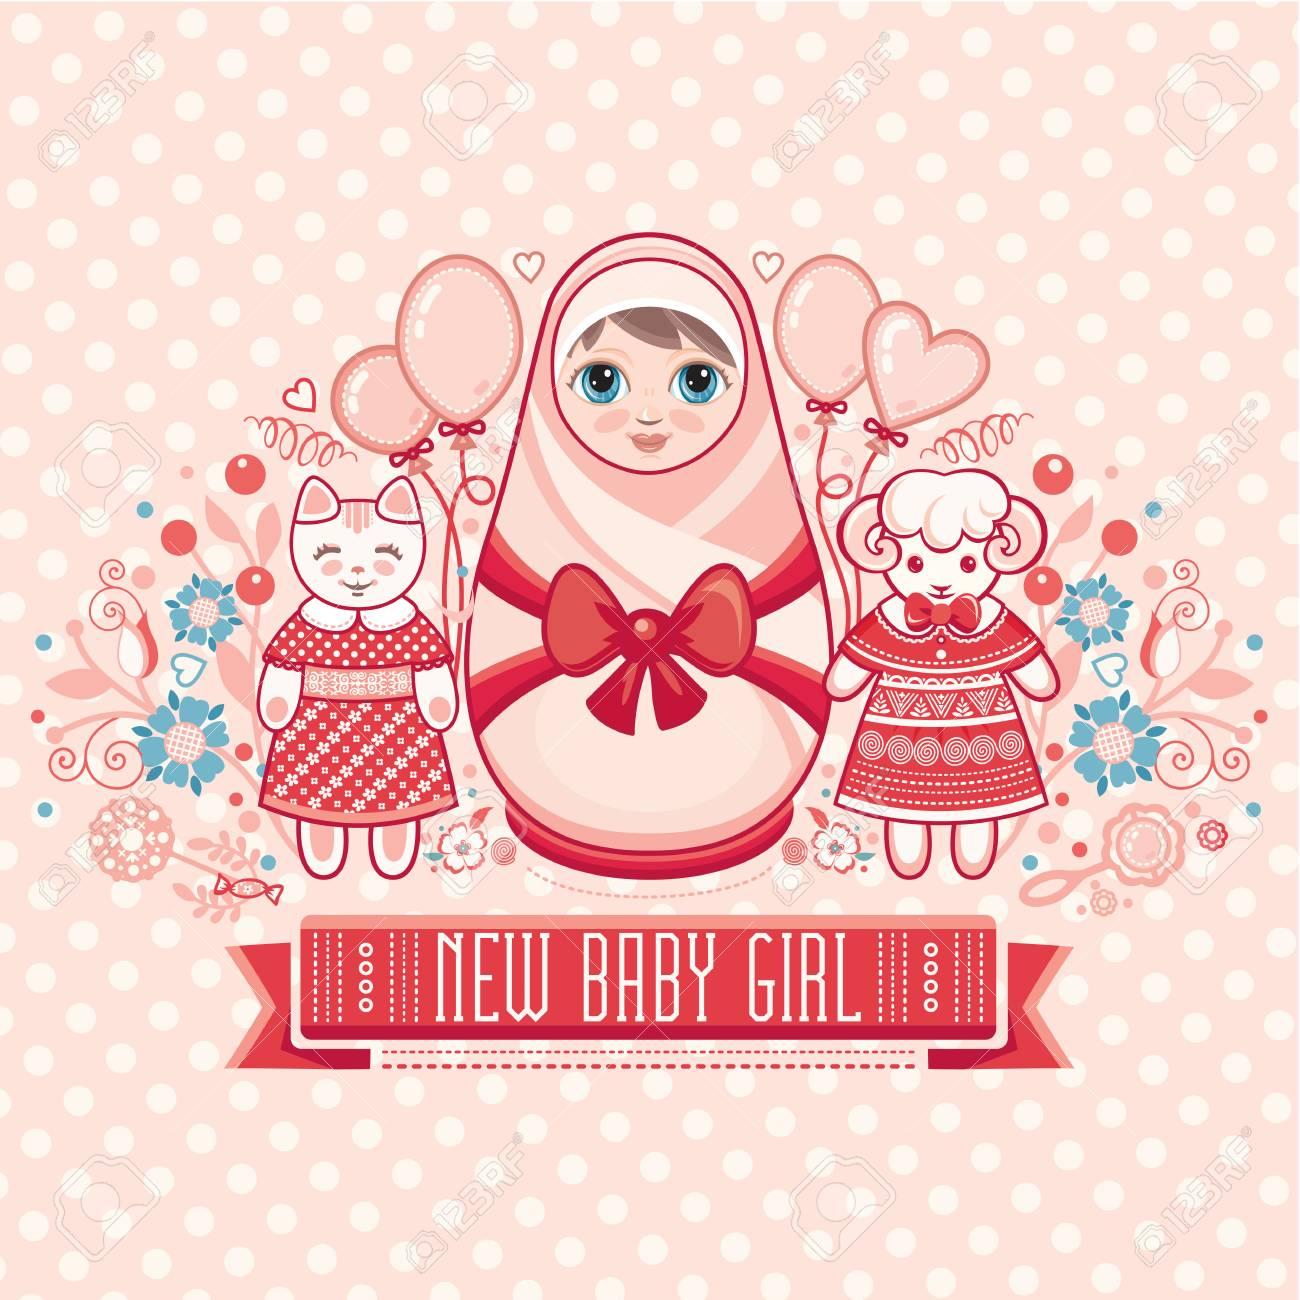 Newborn Little Baby Matryoshka Greeting Card Best For Birthday